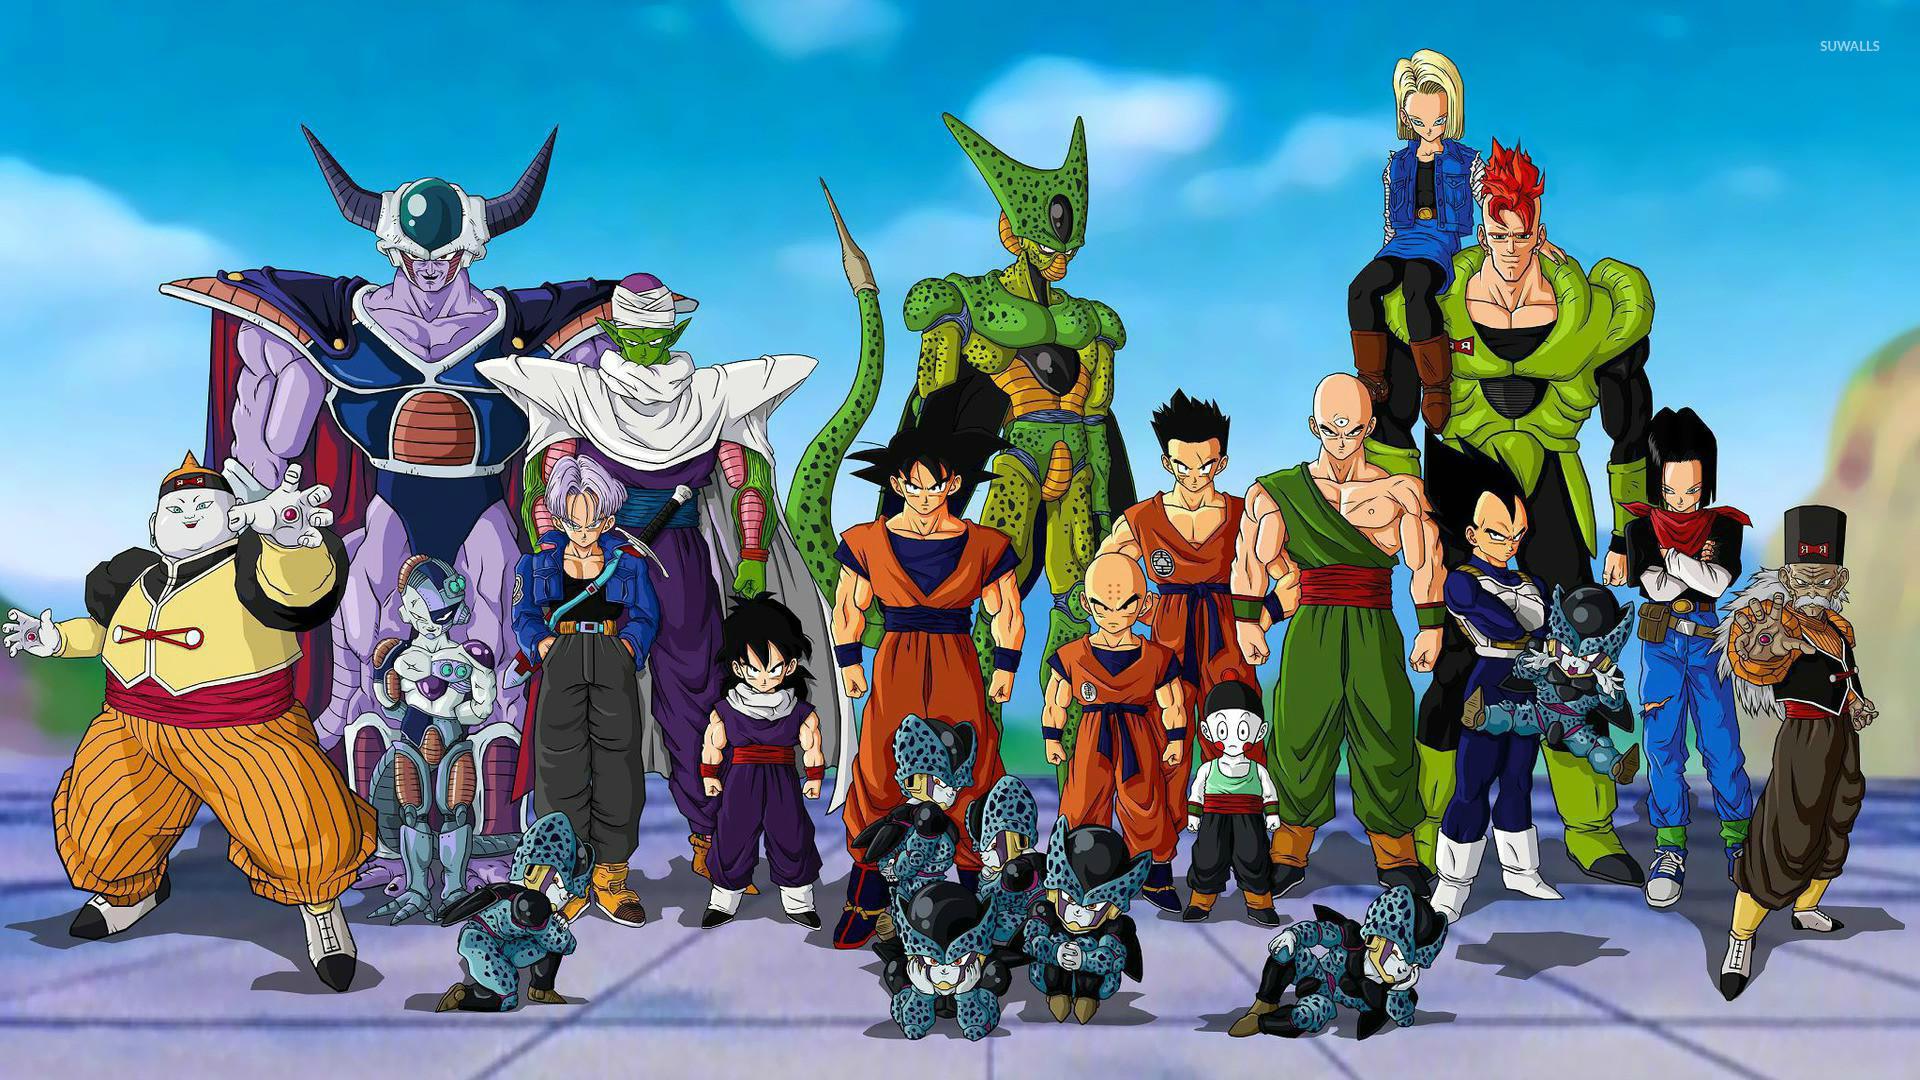 Dragon Ball Z [4] wallpaper jpg